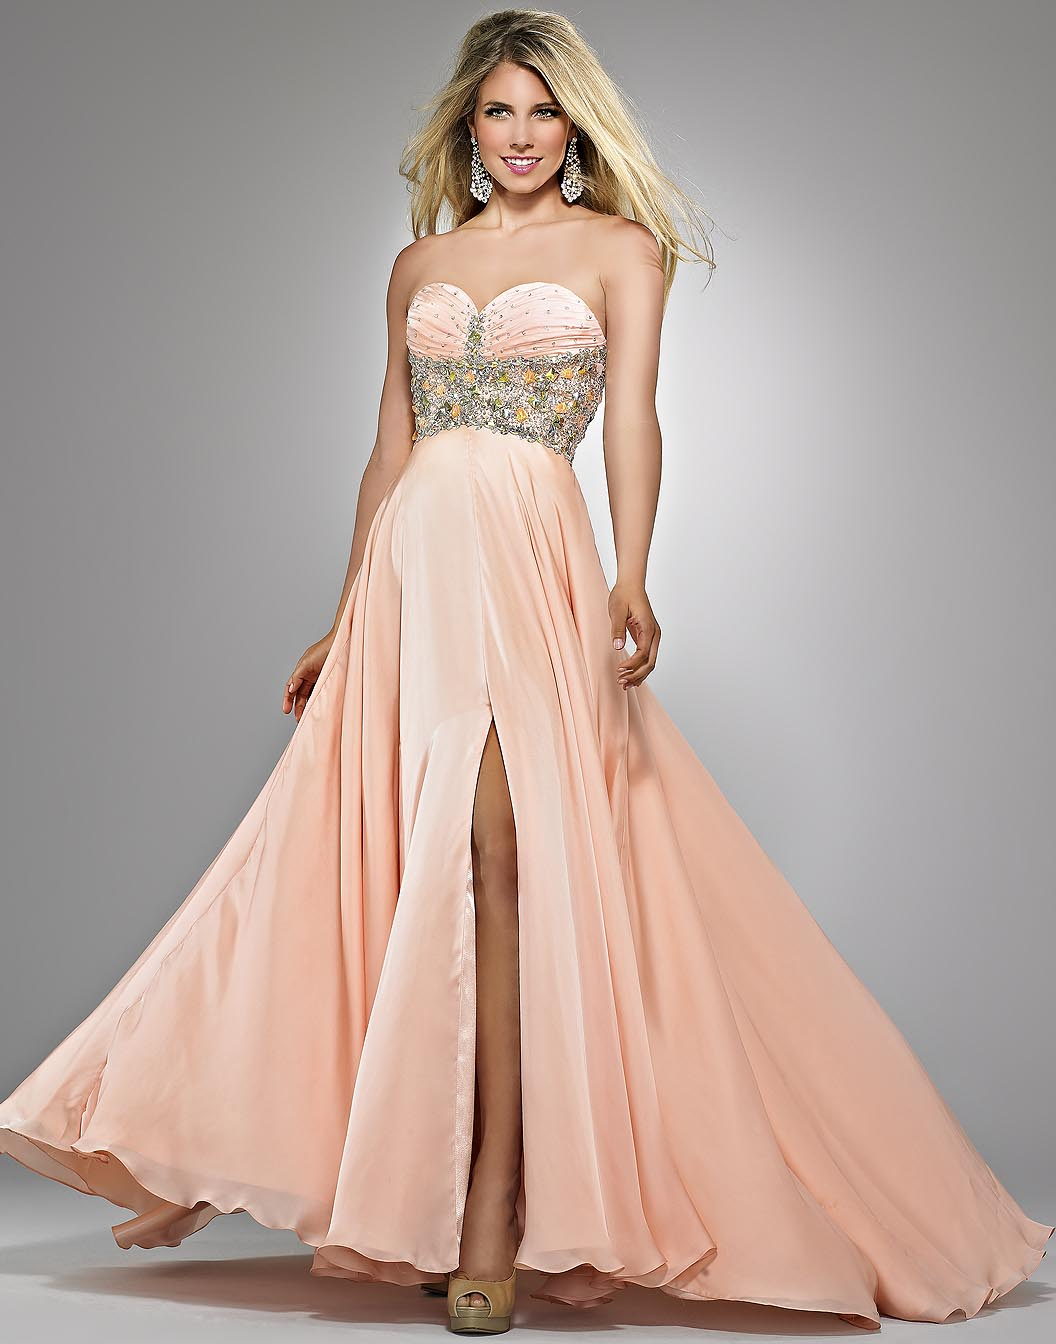 e80c4861084 Peaches Boutique Prom Dresses - Data Dynamic AG